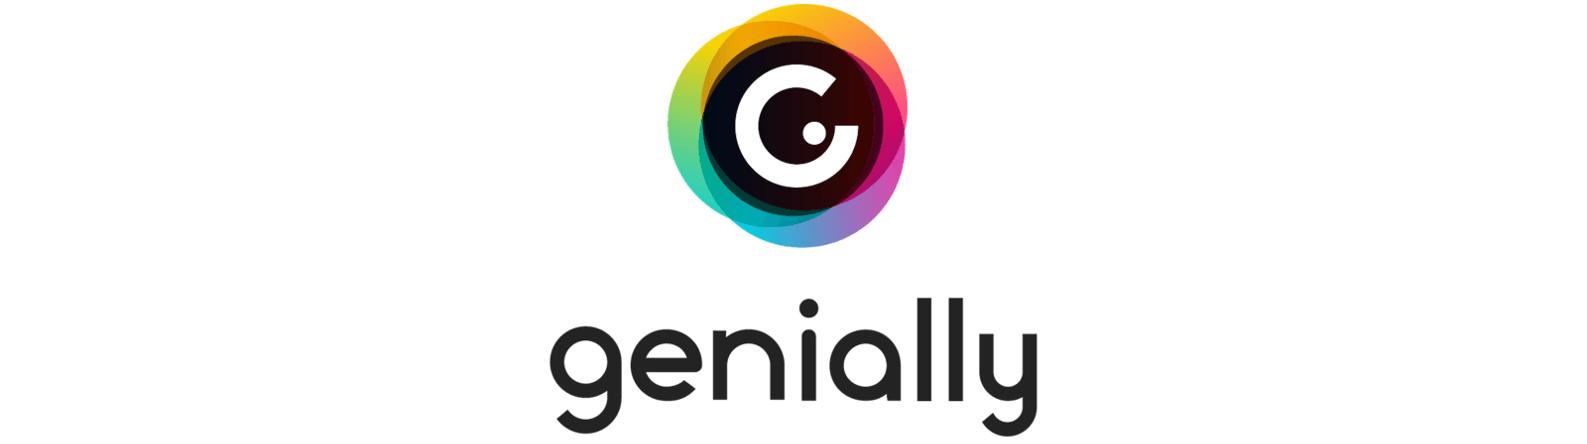 Logo for Genially